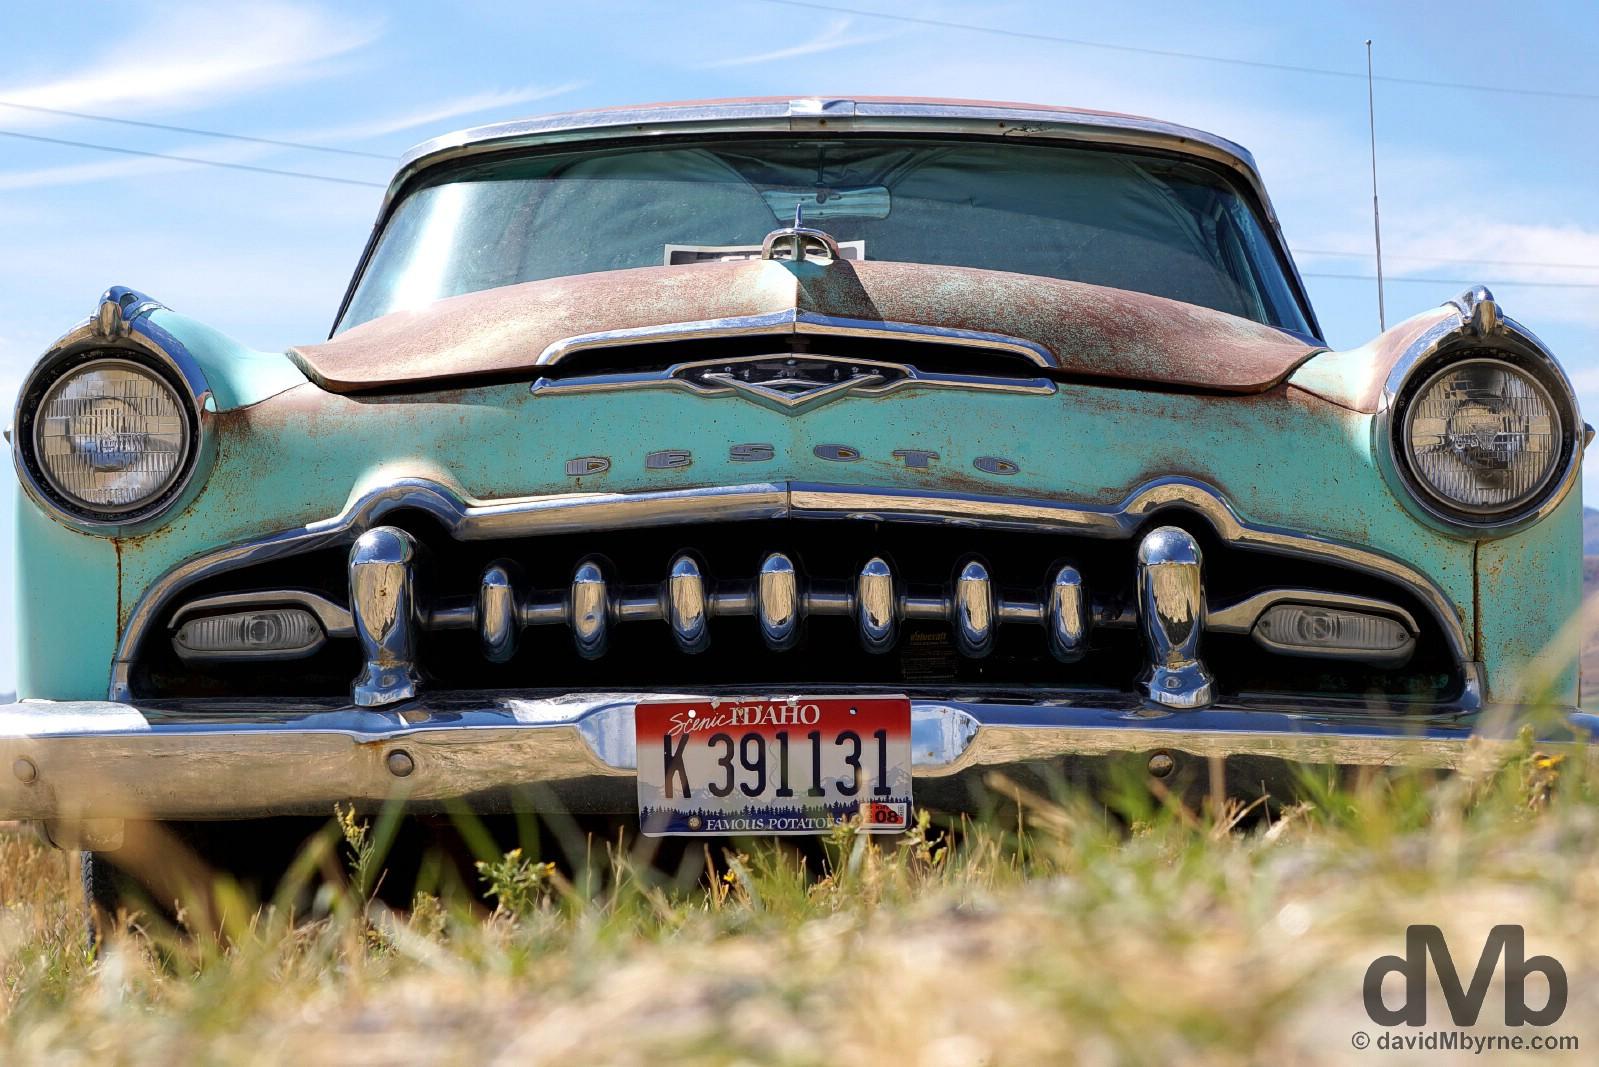 Abandoned 1955 Desoto in Montpelier, Idaho, USA. September 6, 2016.